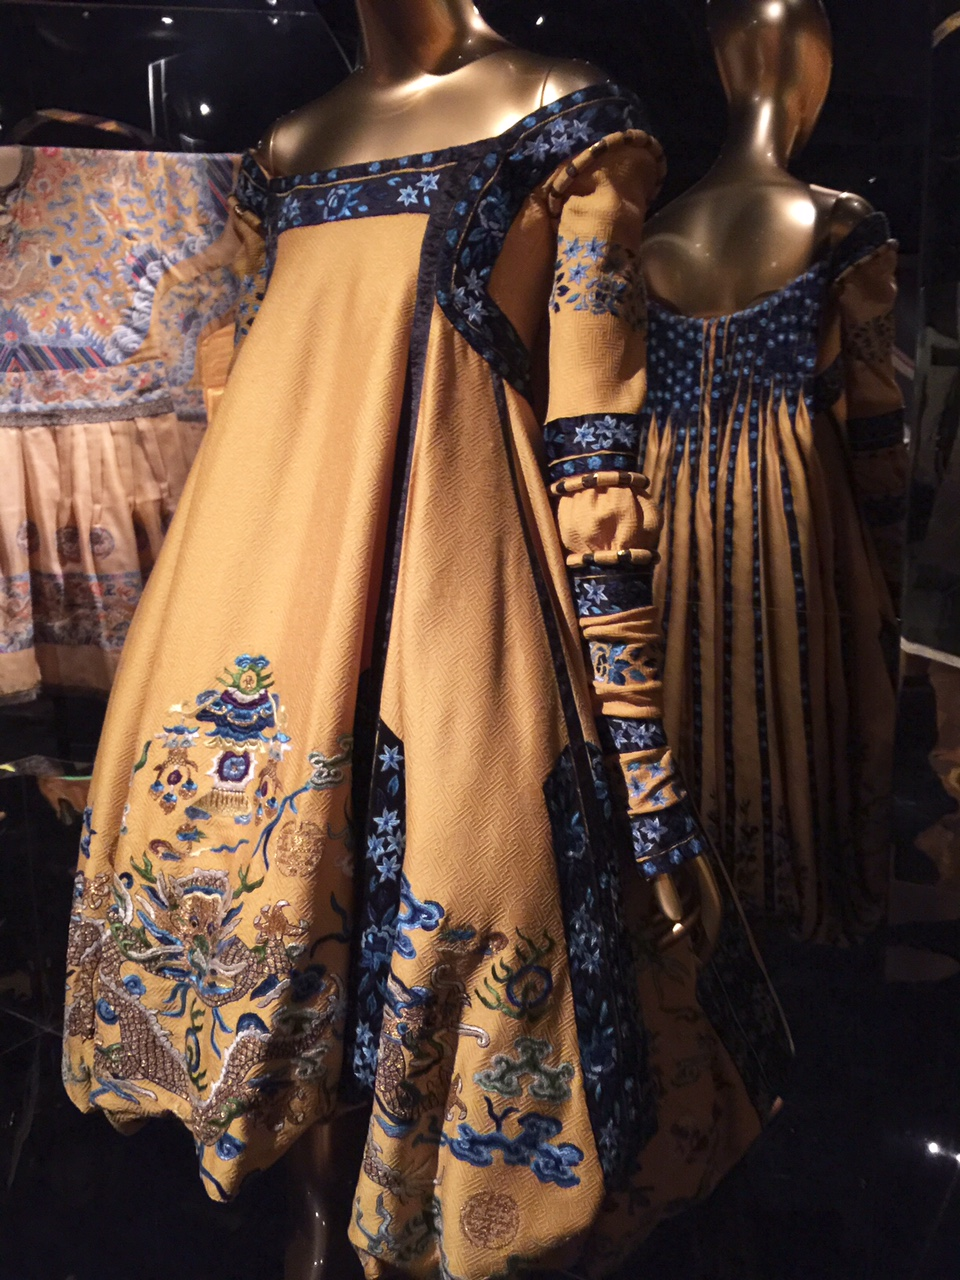 John-Galiano-Dior-Couture-dress-Metropolitan-Museum-NYC-Powerful-Goddess-Portraits